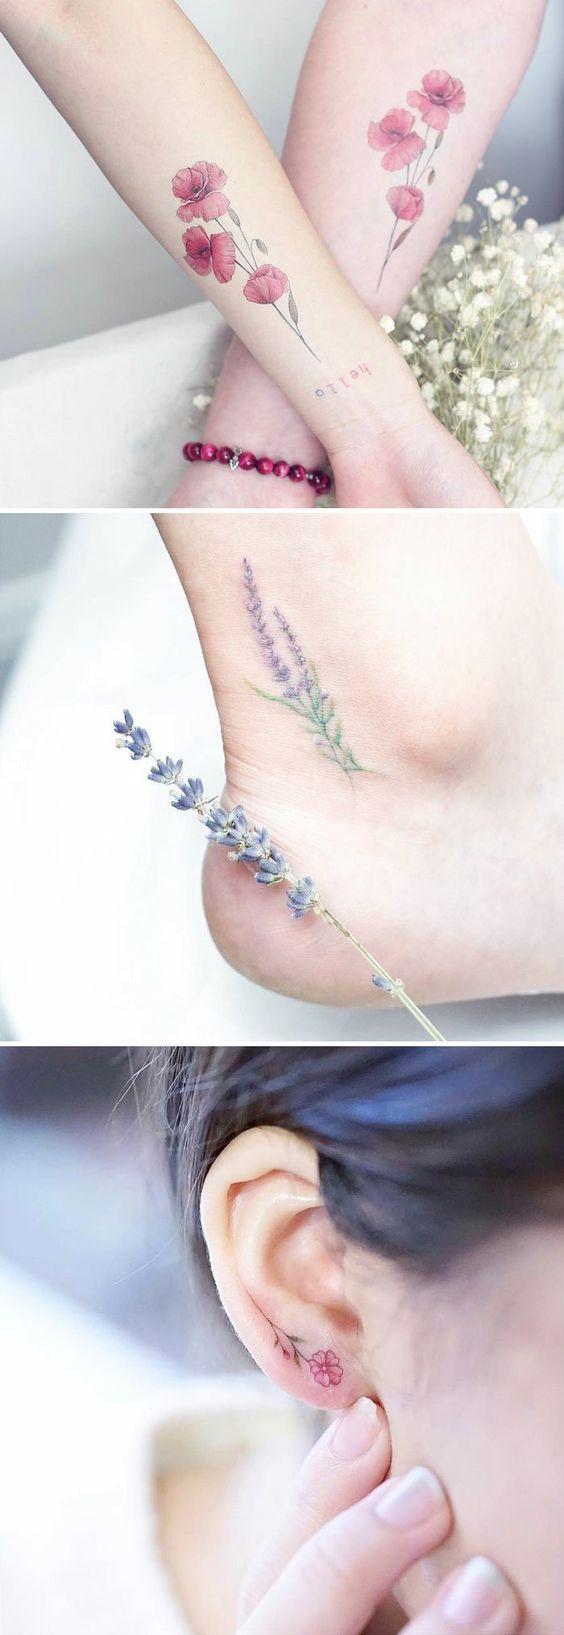 fleur-de-tiaré-tatouage-fleurs-tatouage-de-fleur-mini-tatoo